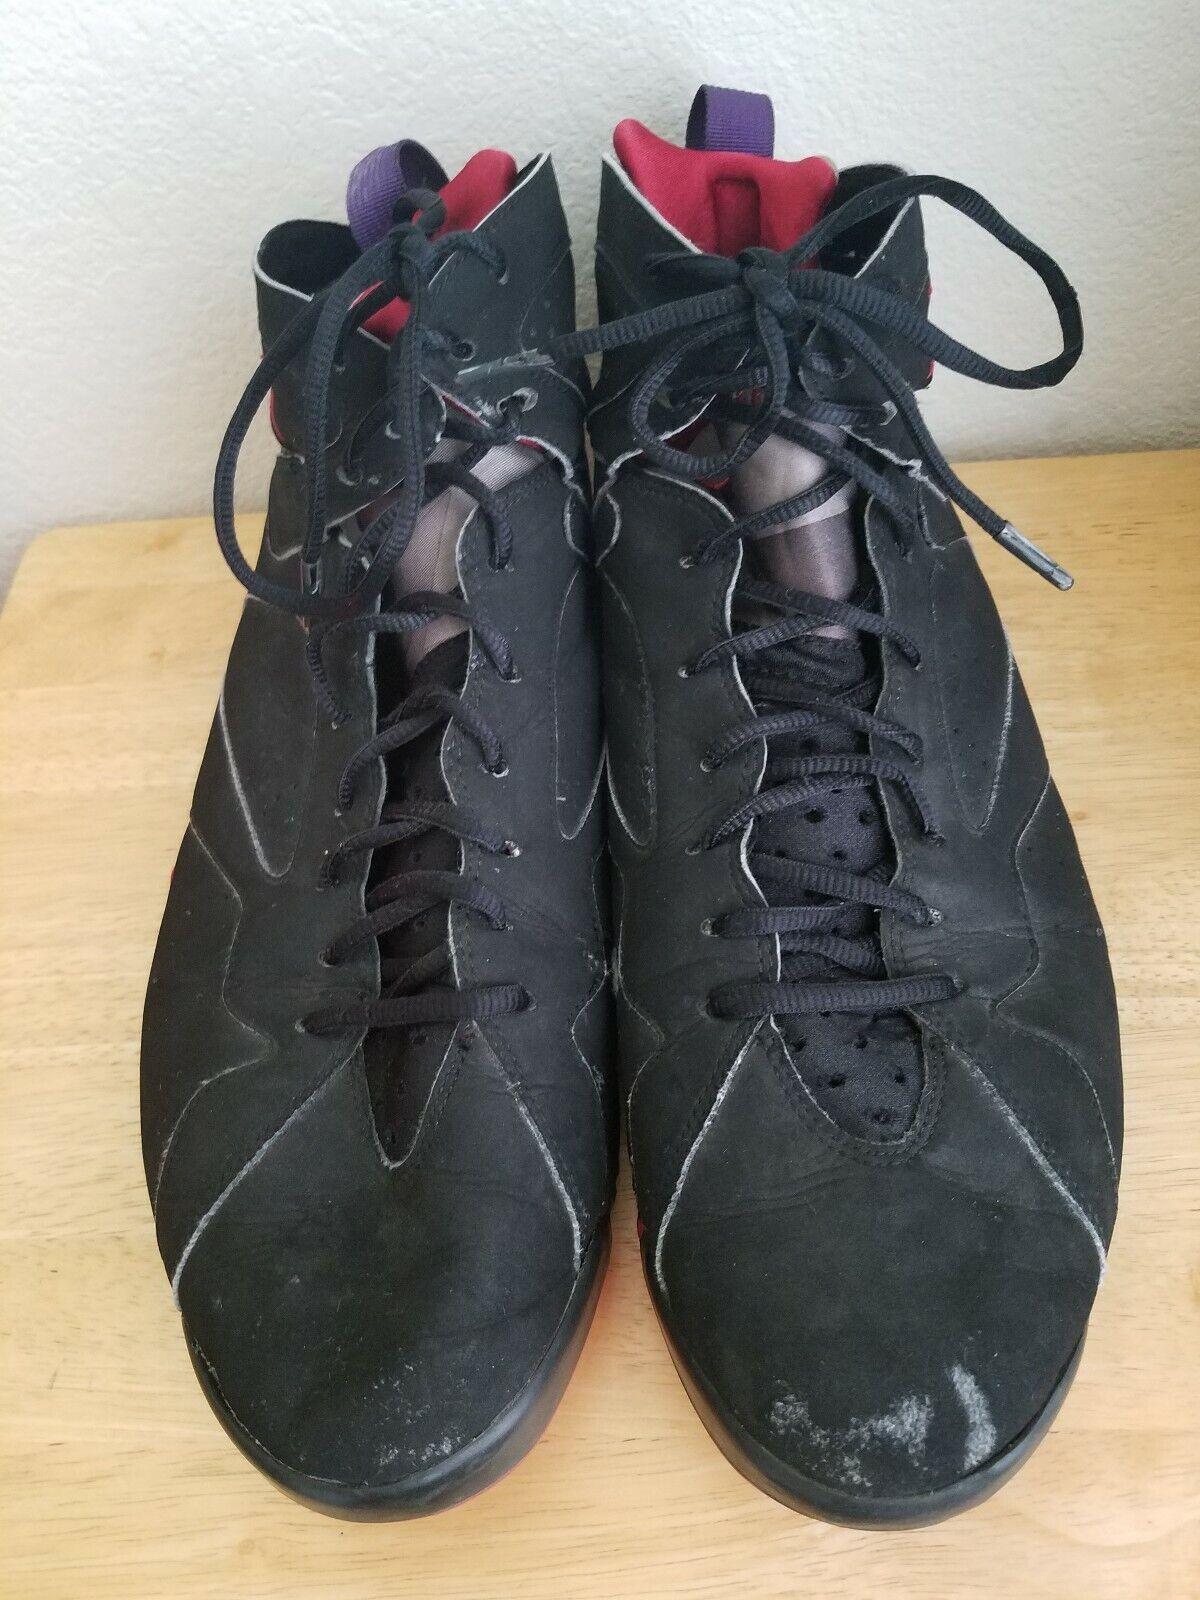 Nike Air Jordan 7 Retro Raptor 2012 304775-018 Black Red Men's Size 14